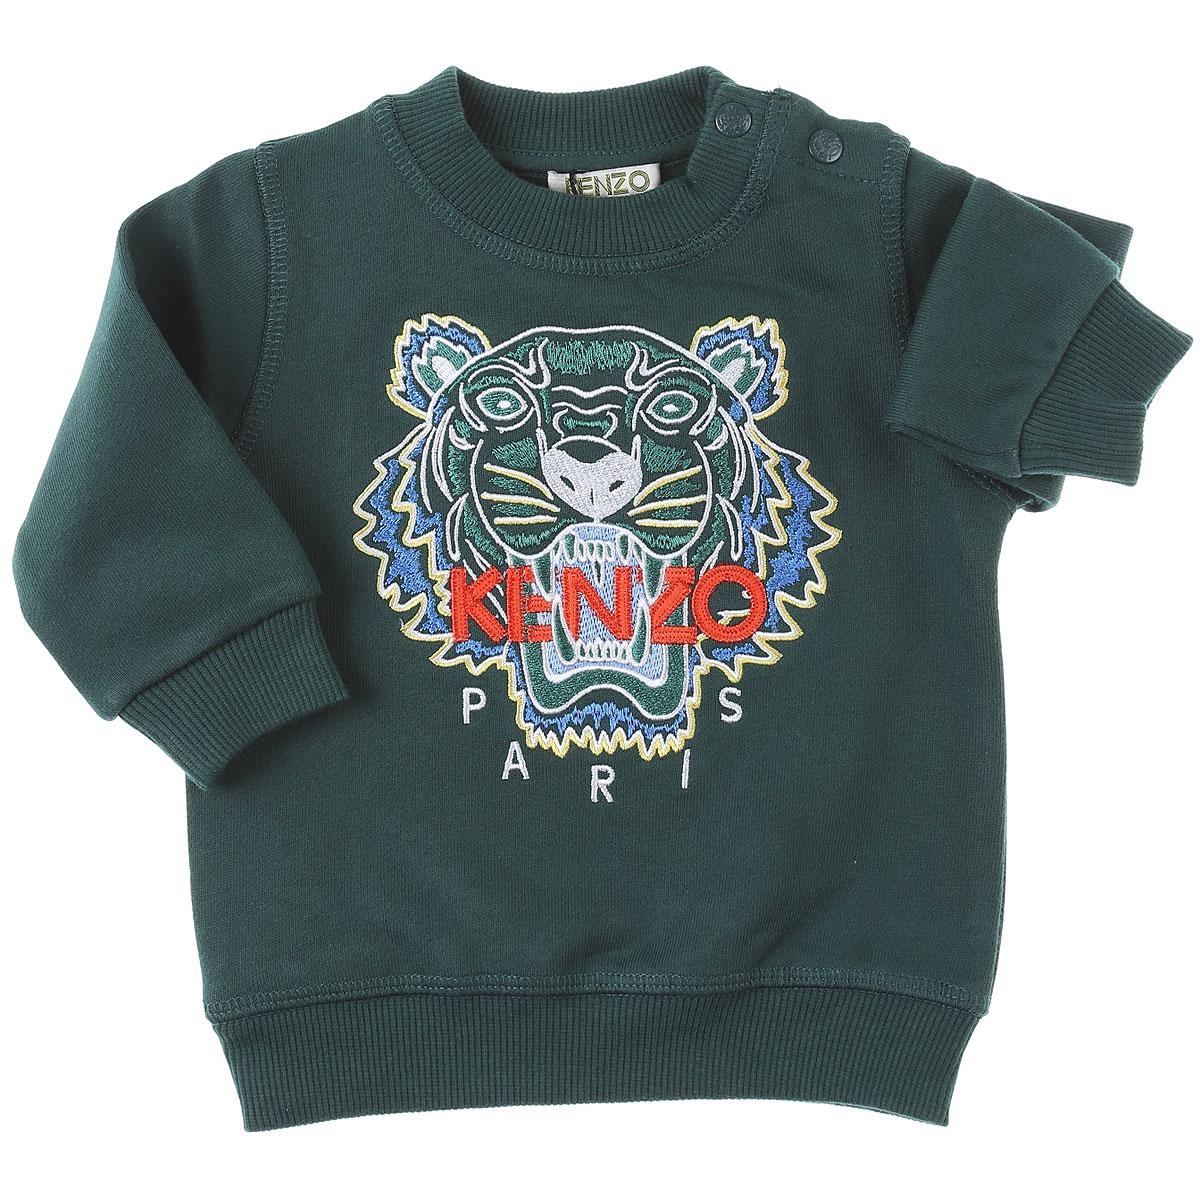 Kenzo Baby Sweatshirts & Hoodies for Boys On Sale, Green, Cotton, 2019, 12 M 18M 6M 9M